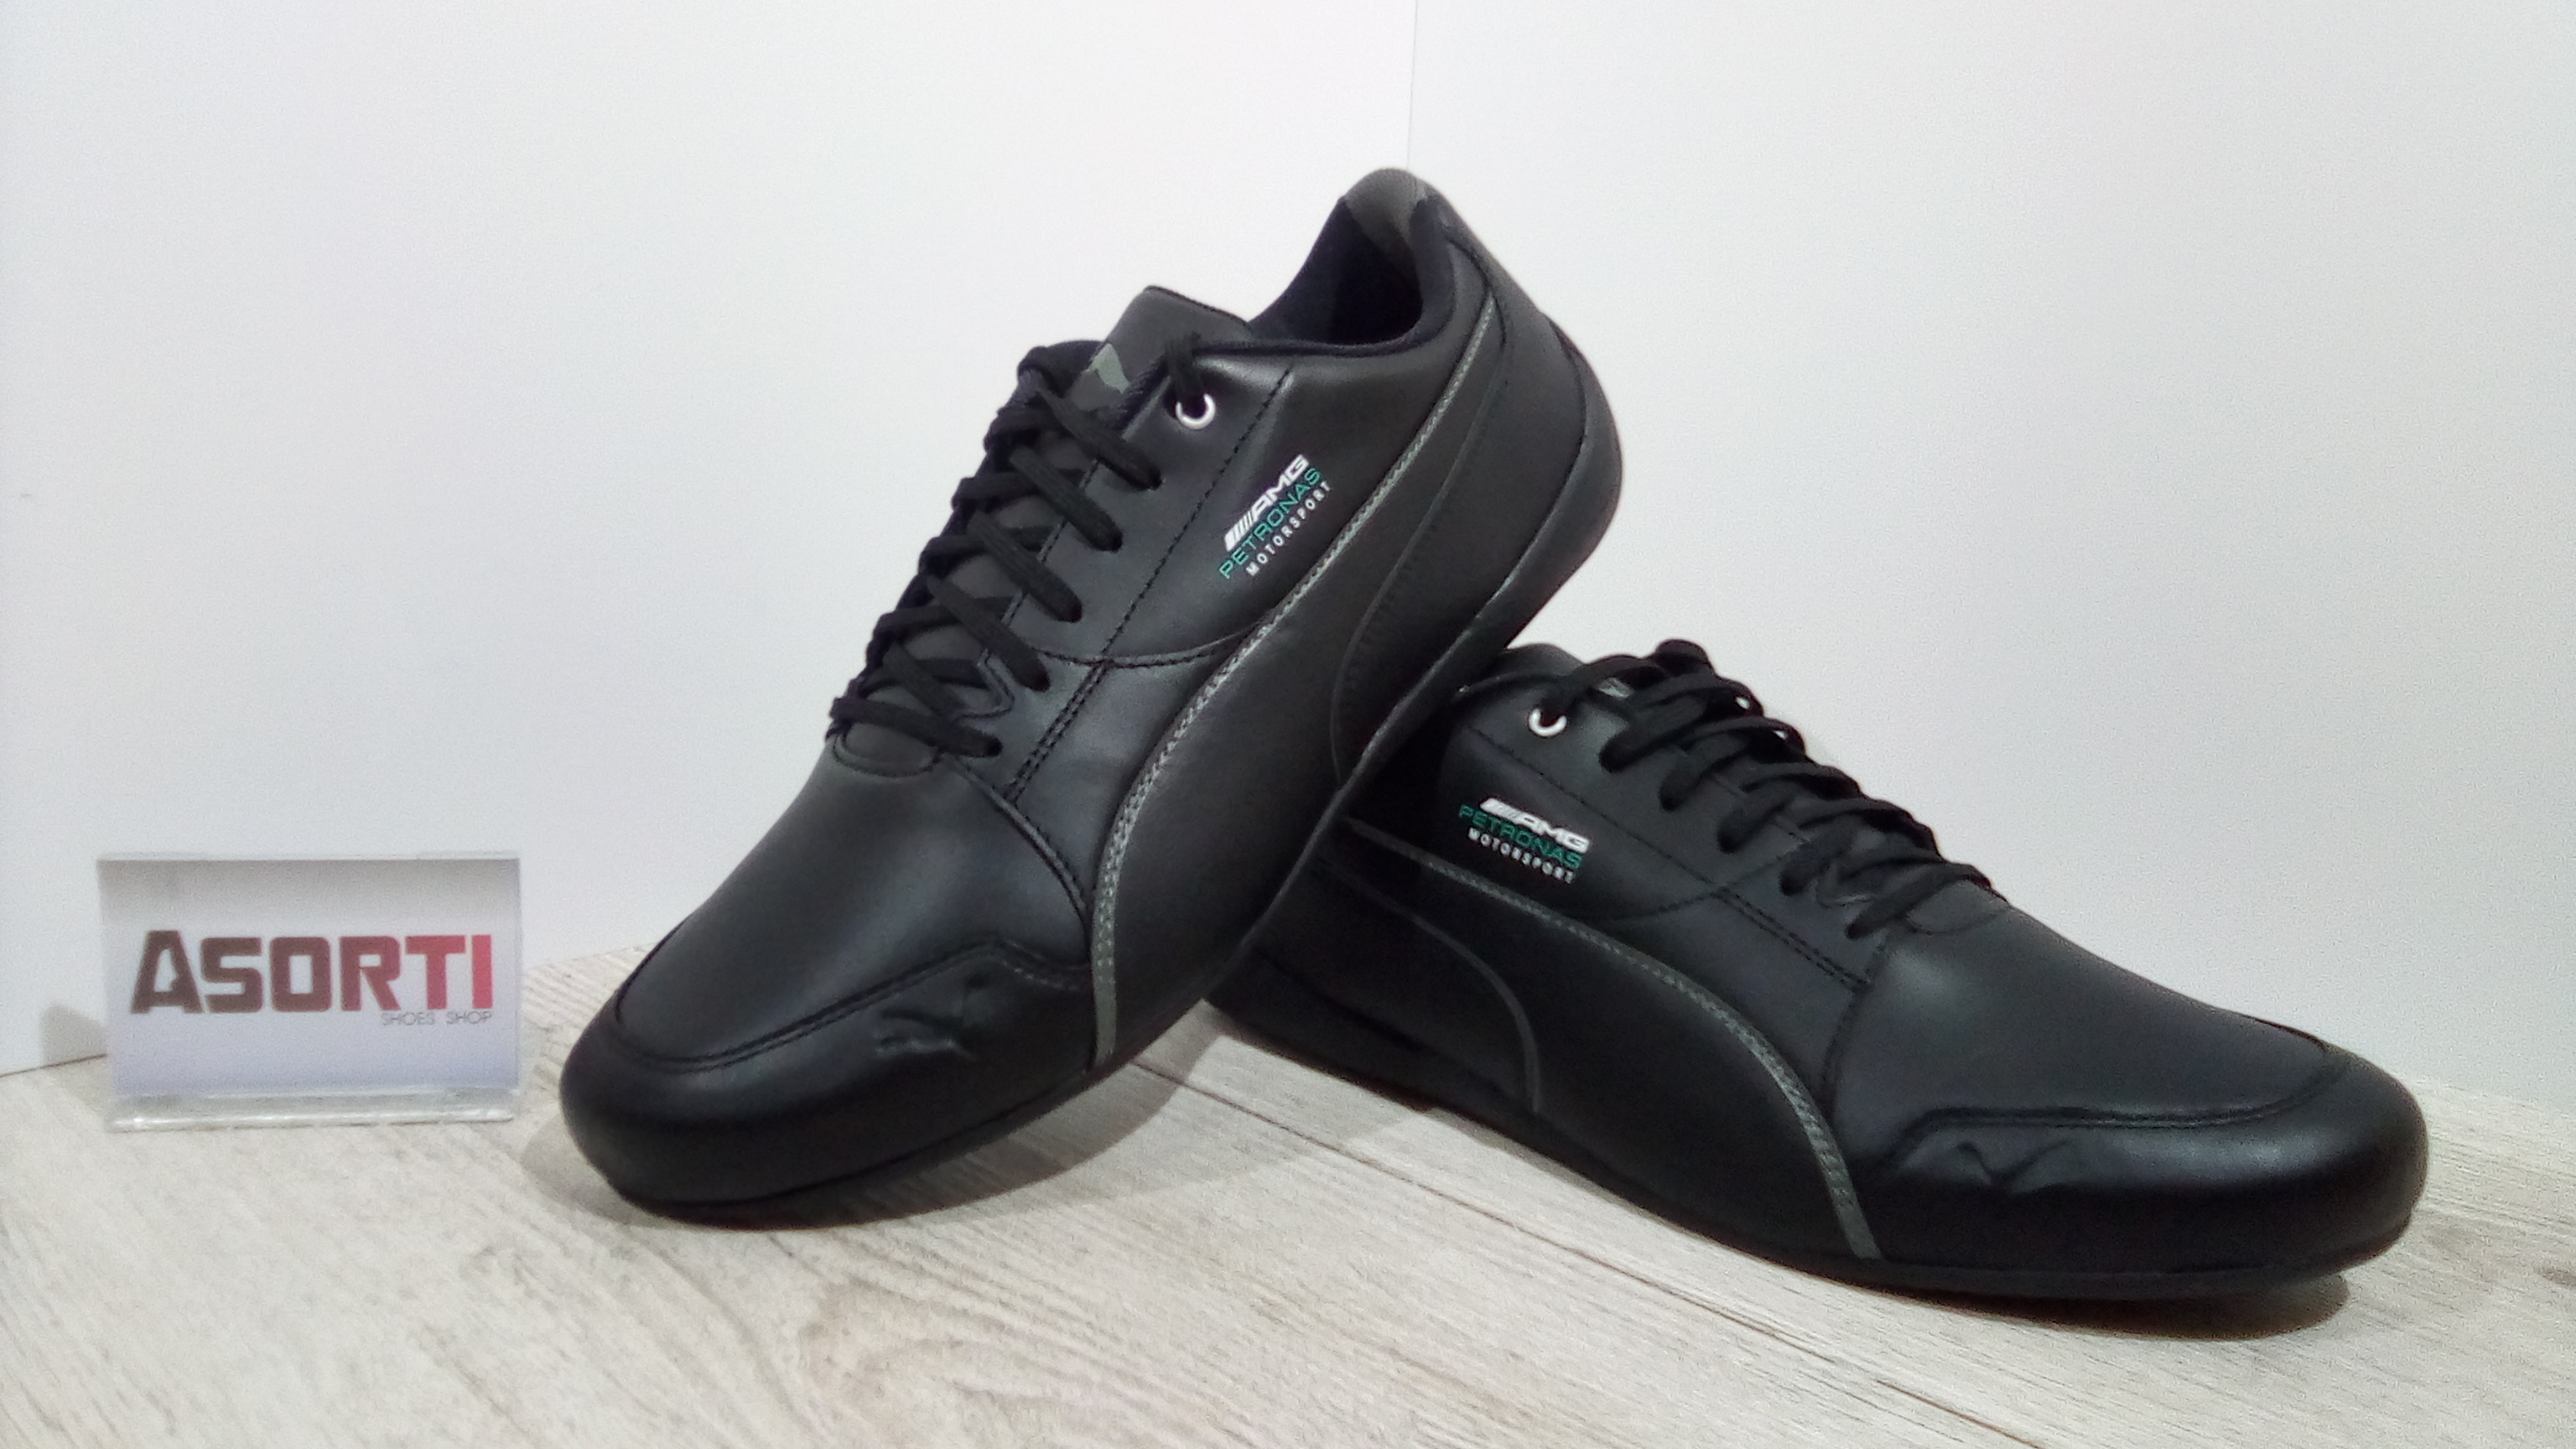 751263b1 Мужские кроссовки Puma Mercedes Motorsport Drift Cat 7 (306150-02) черные